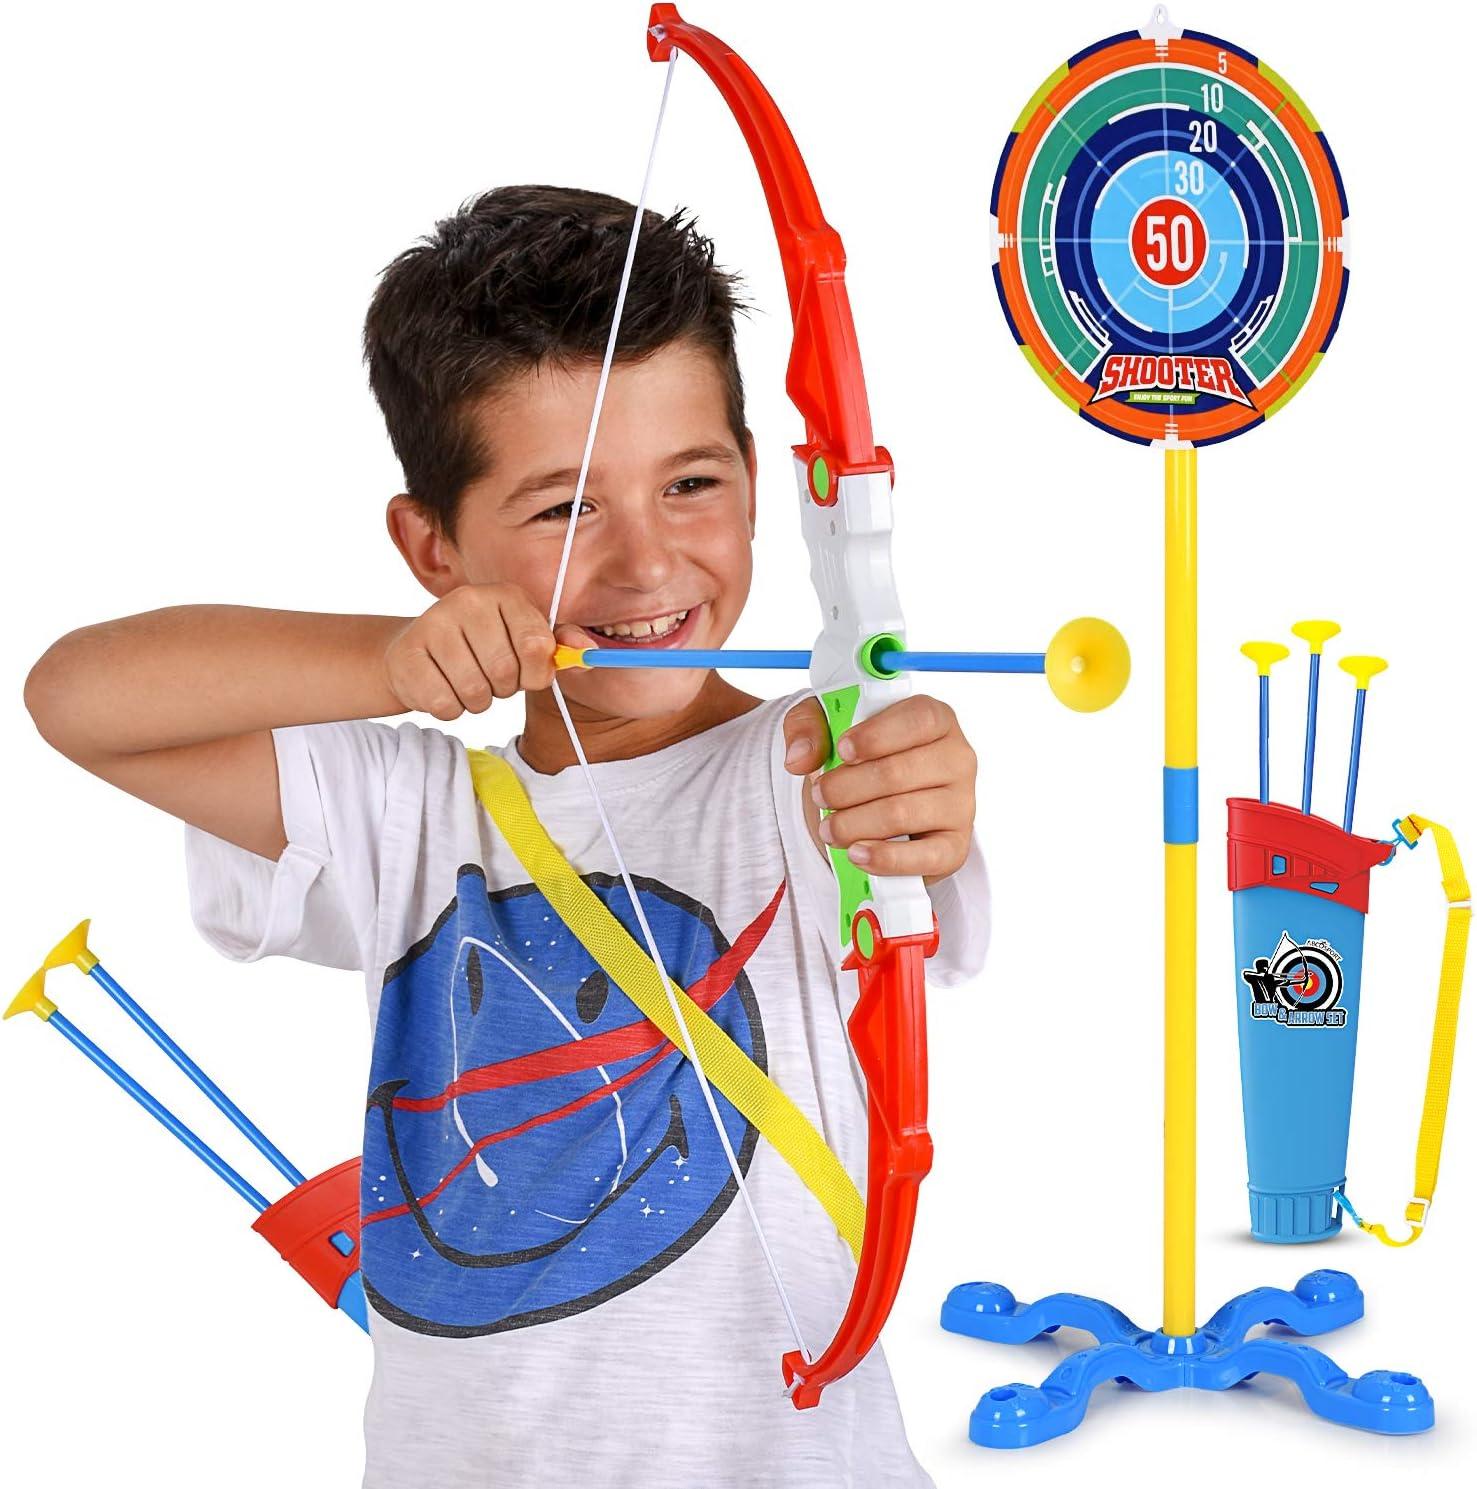 1PC Arrow sponge Archery Soft Tipped Battle Practice Accessory Target Portable